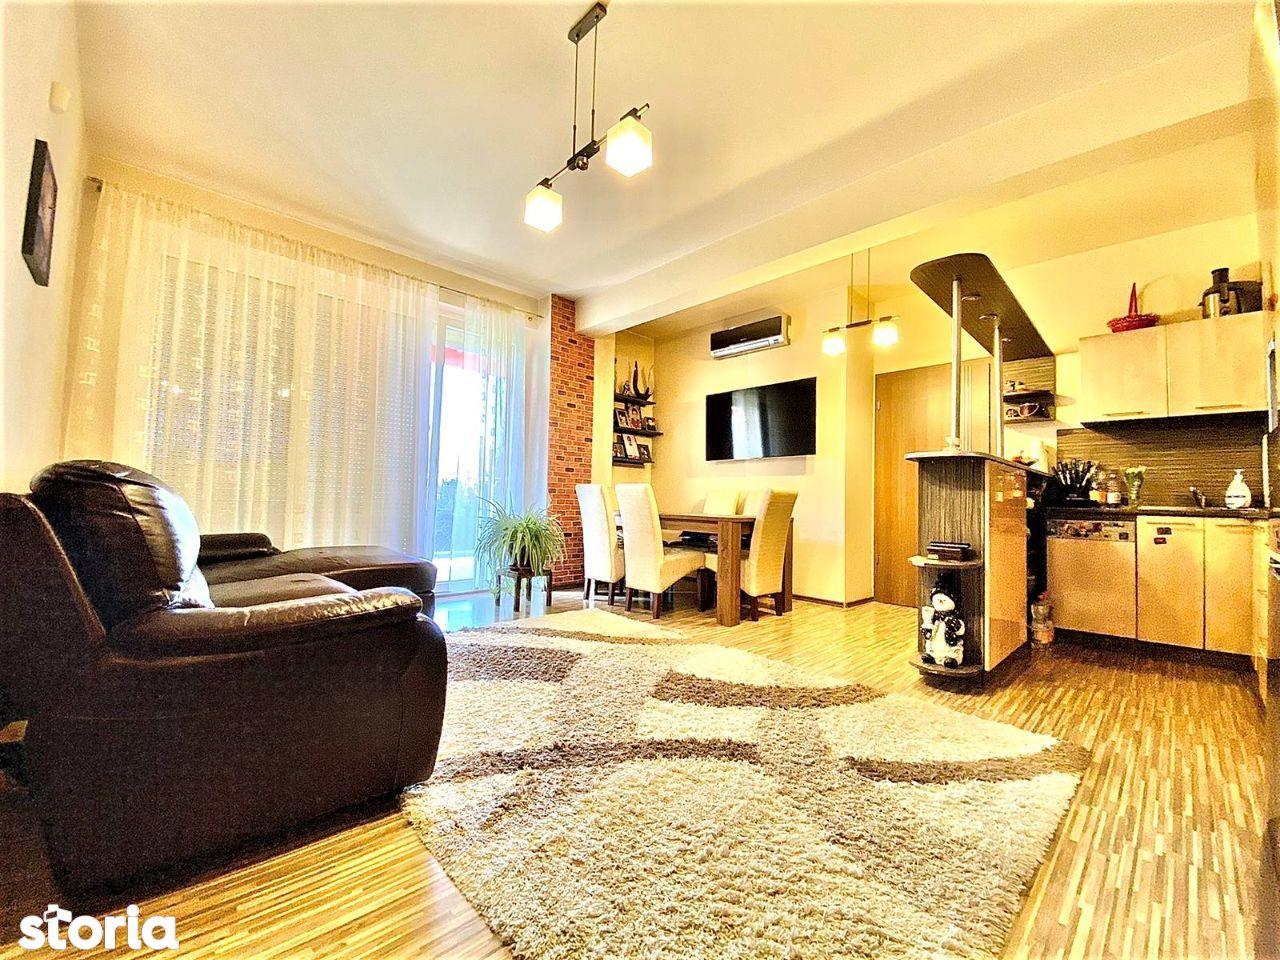 Apartament 3 camere 118mp Ared UTA etaj 1 - 98500 euro